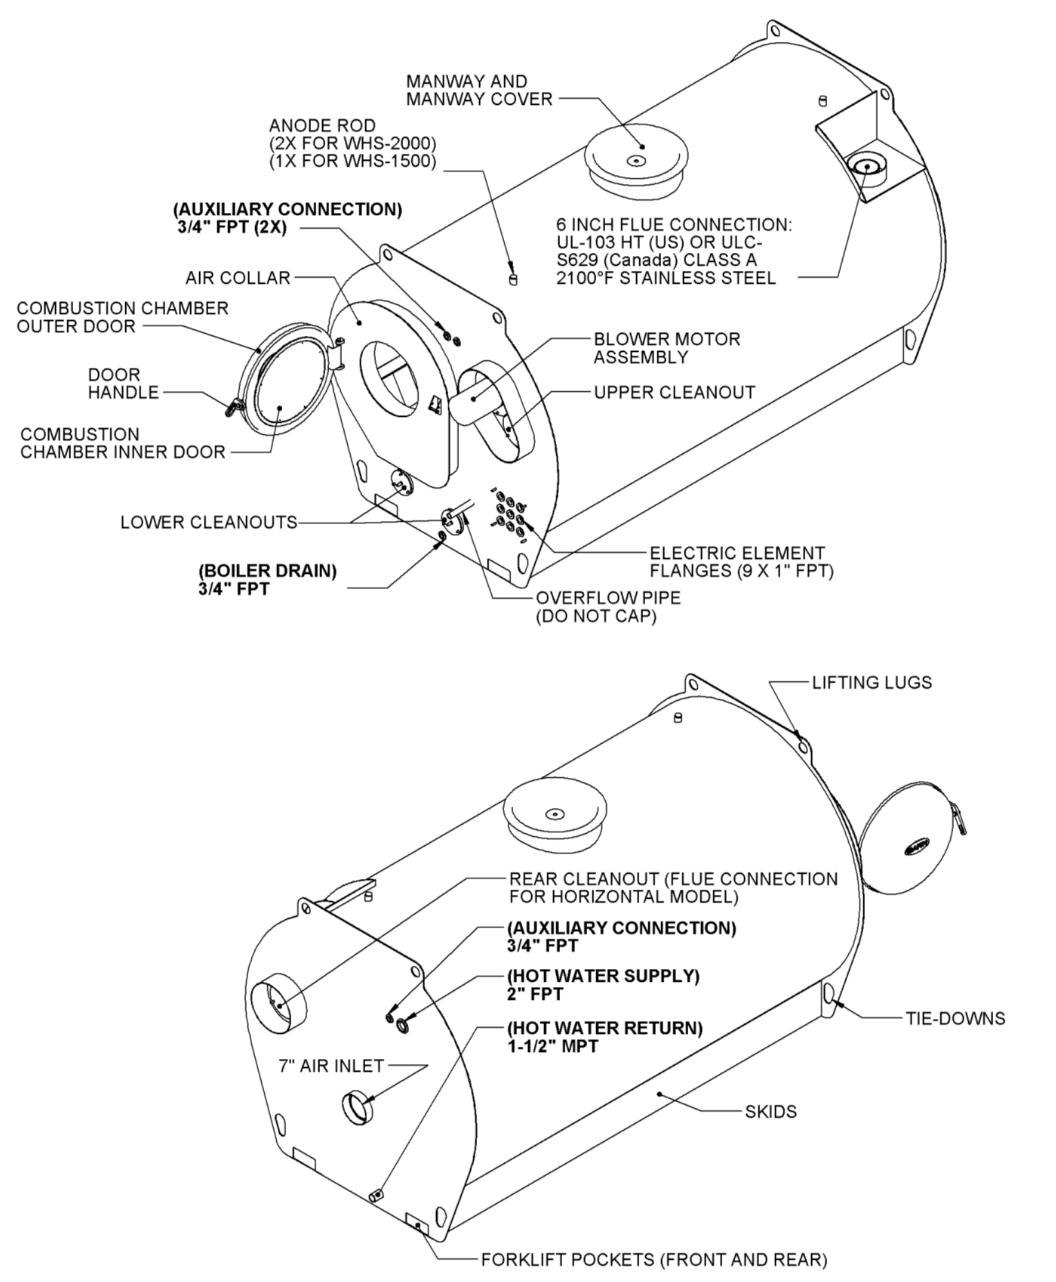 hight resolution of  ruud furnace parts diagram model rrgg 05n31jkr